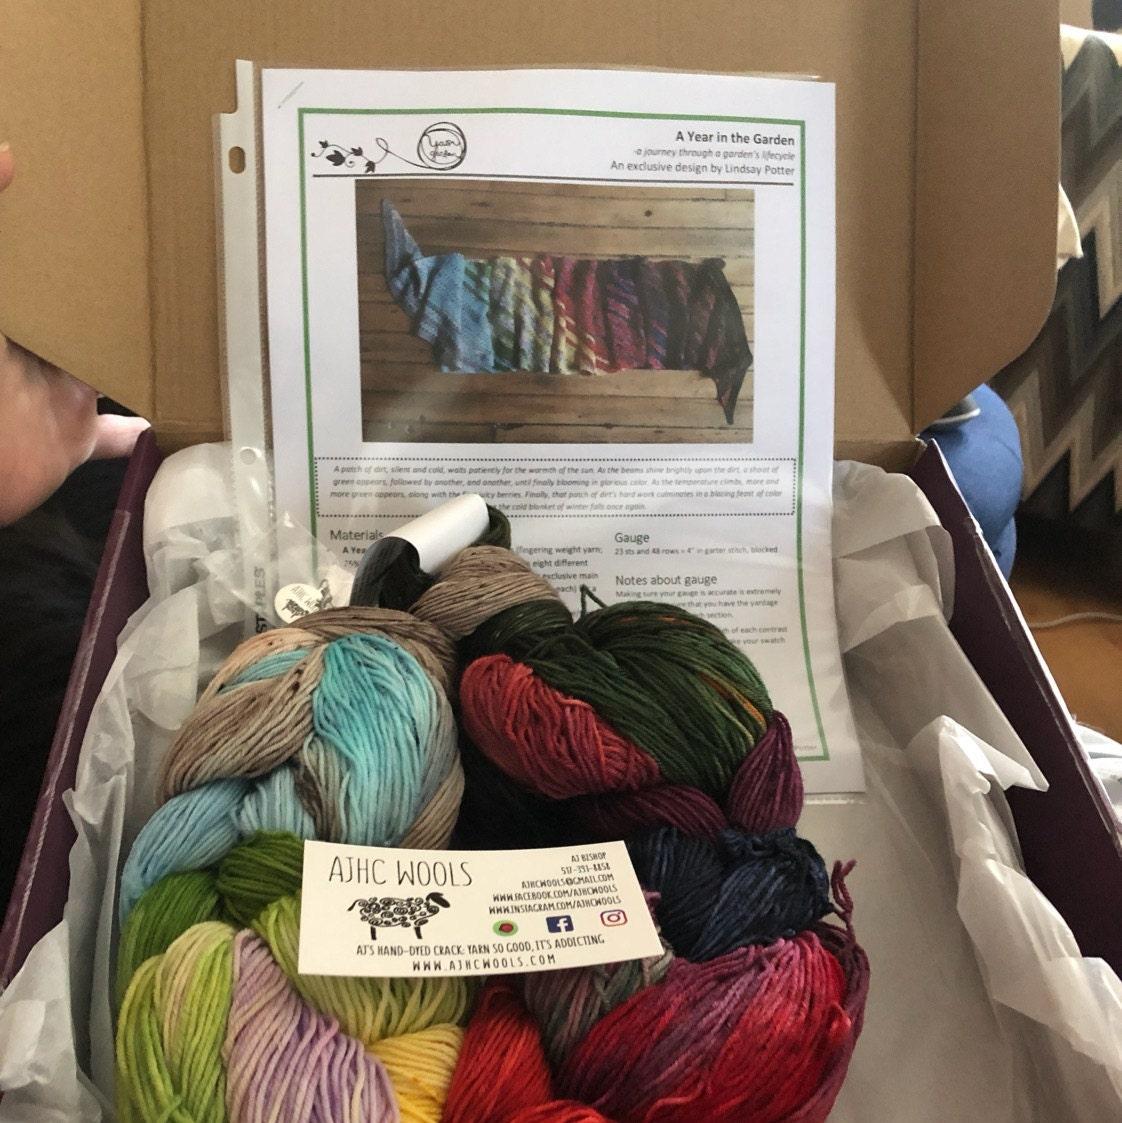 Elizabeth Hall added a photo of their purchase